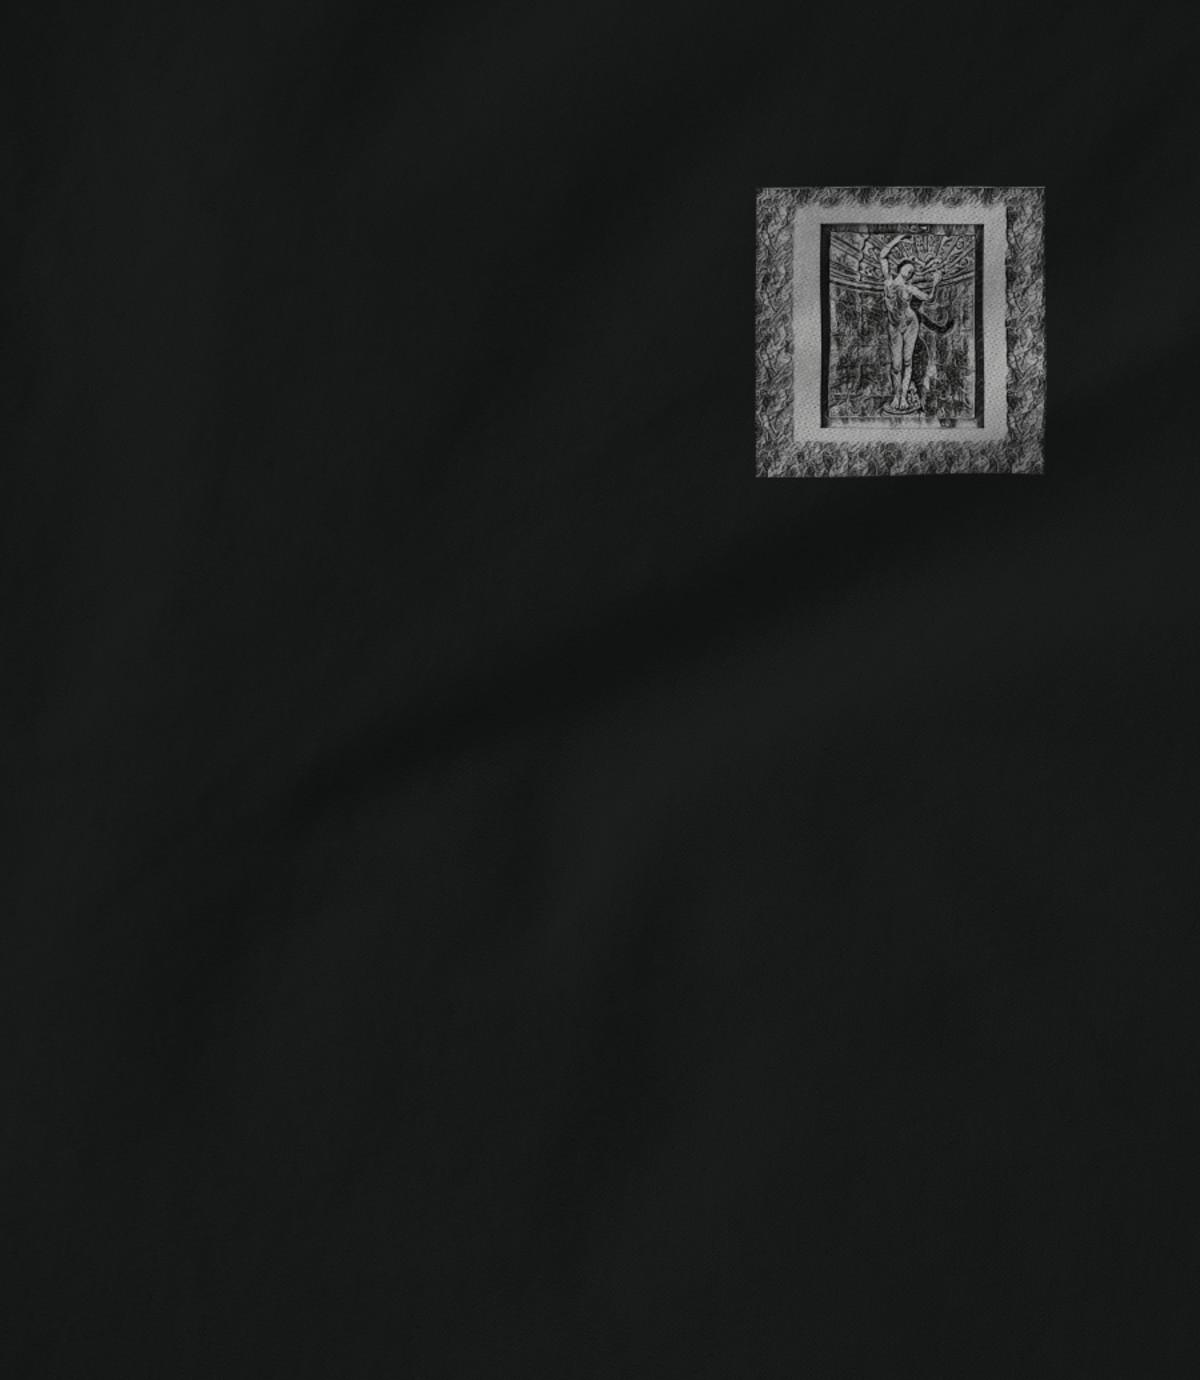 Jennifer doll  statue in black 1535324809